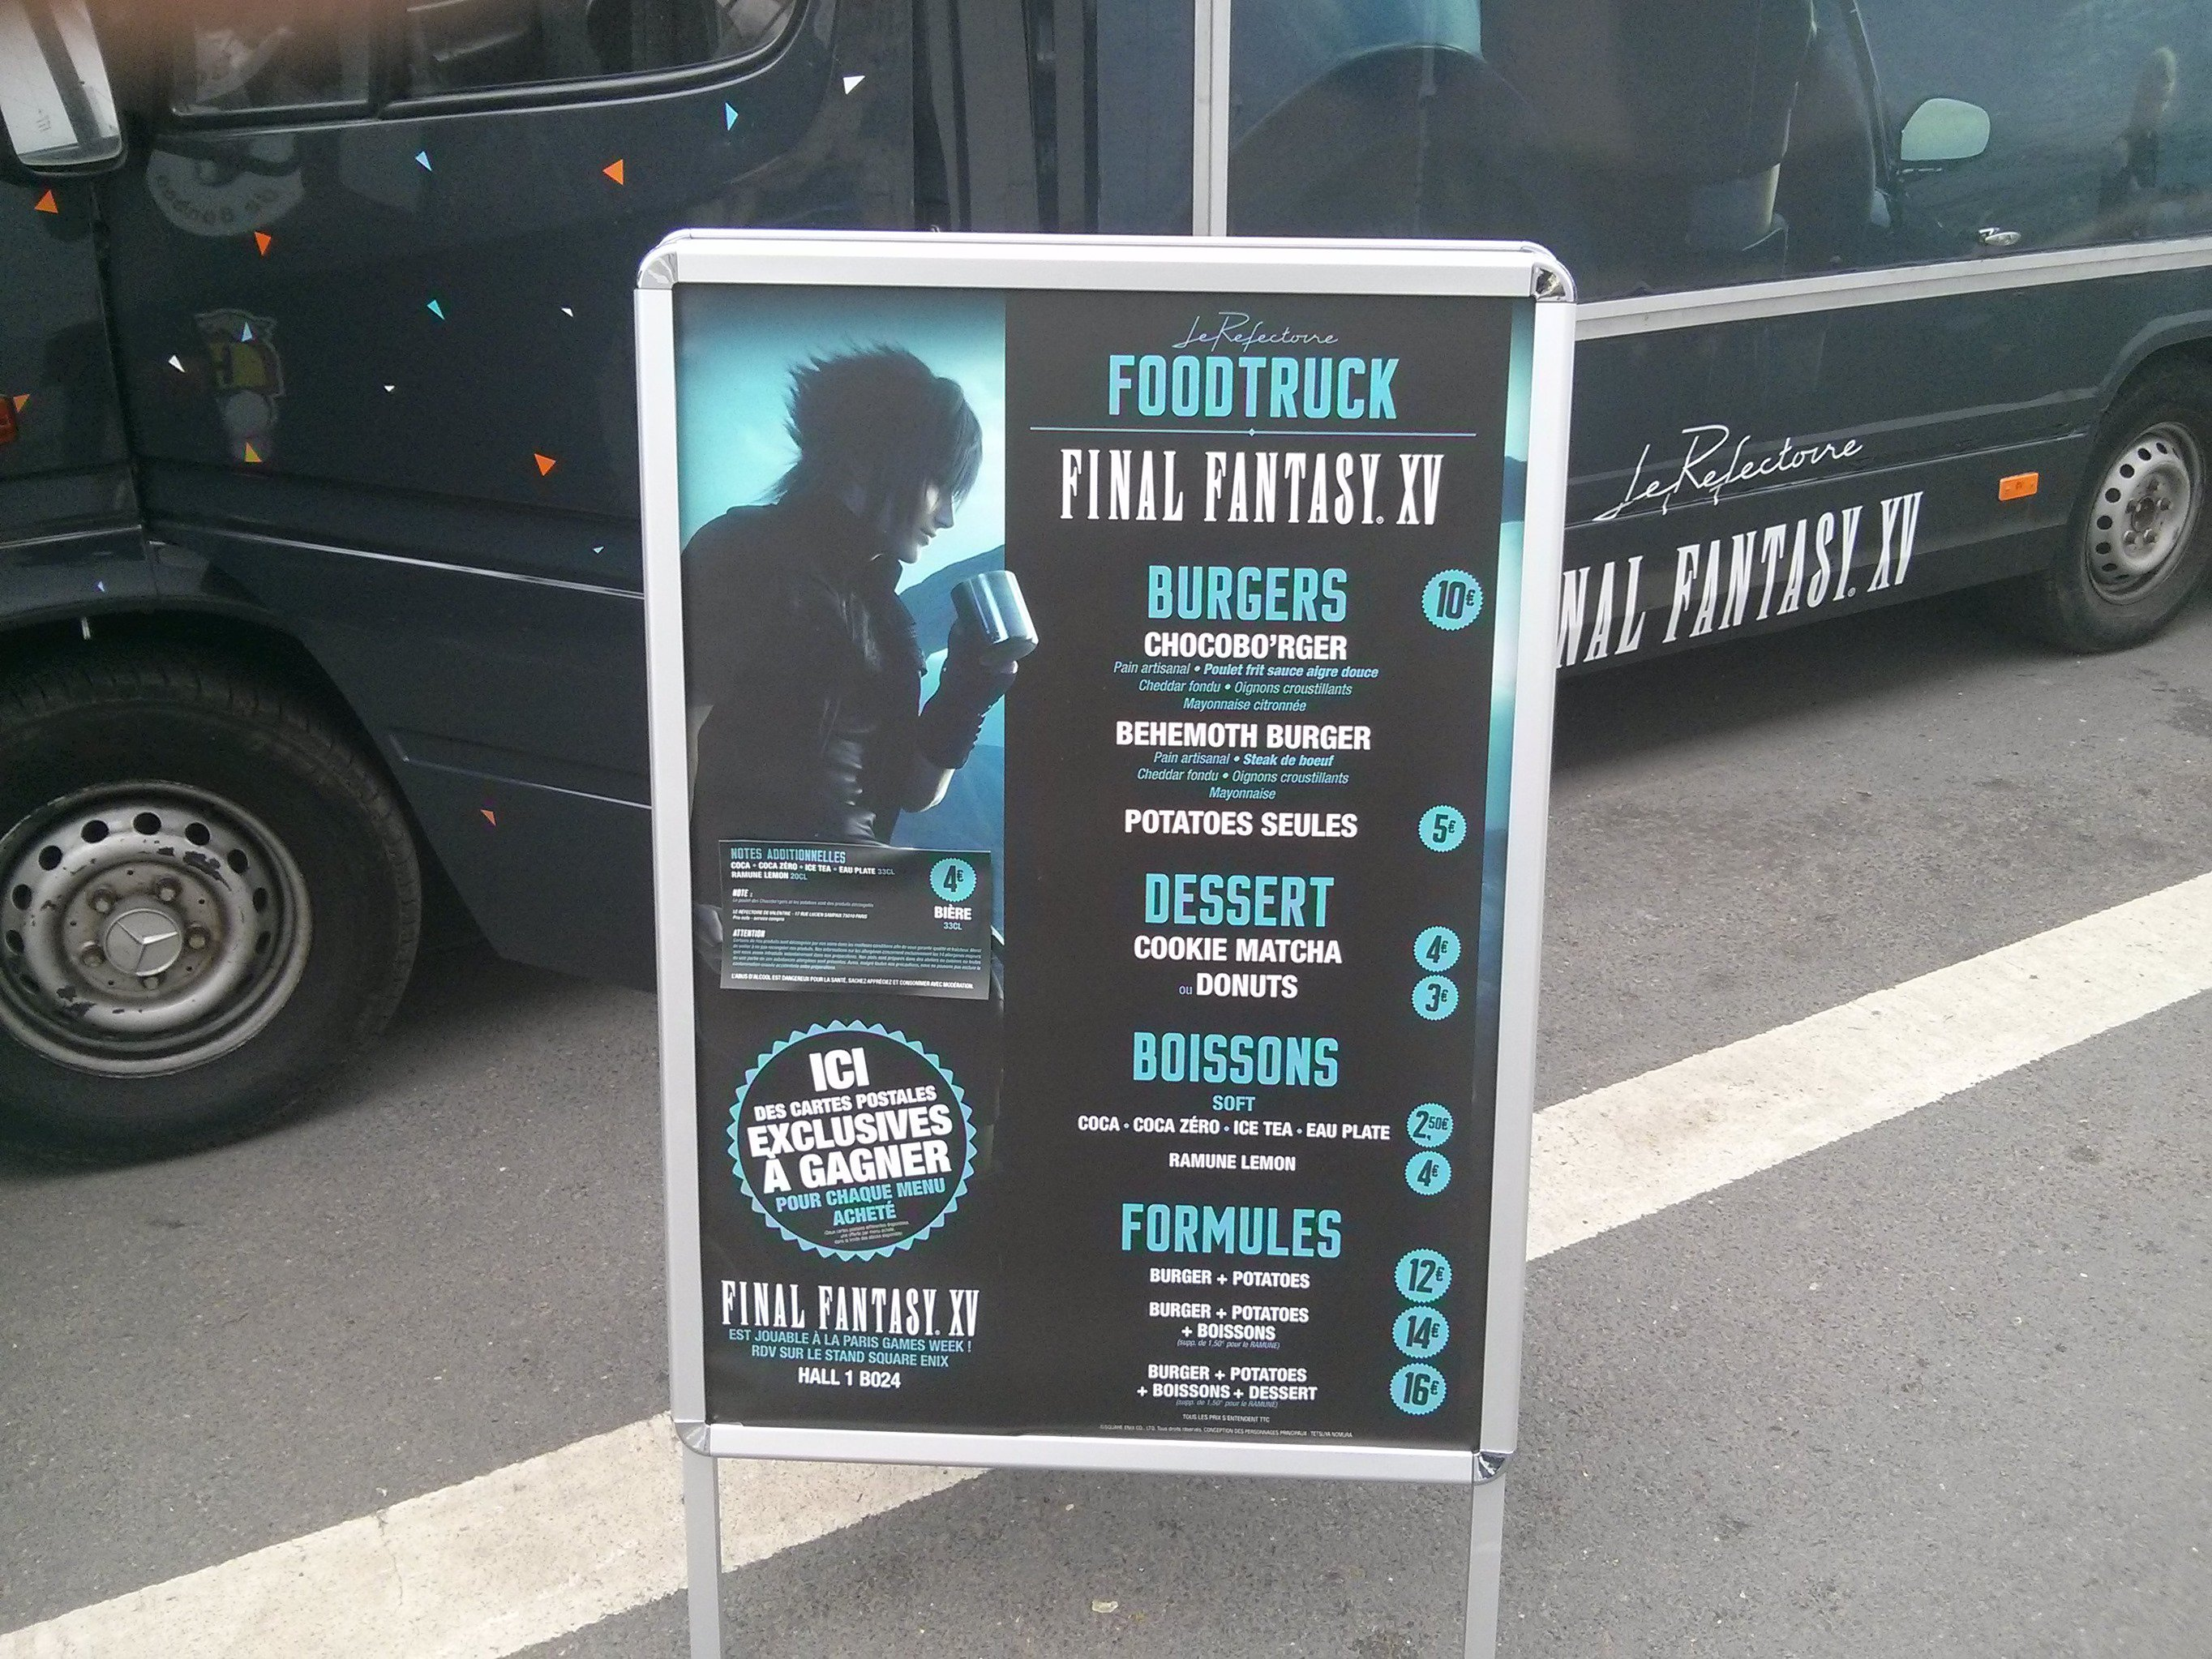 Final Fantasy XV Food Truck Serves Burgers 3